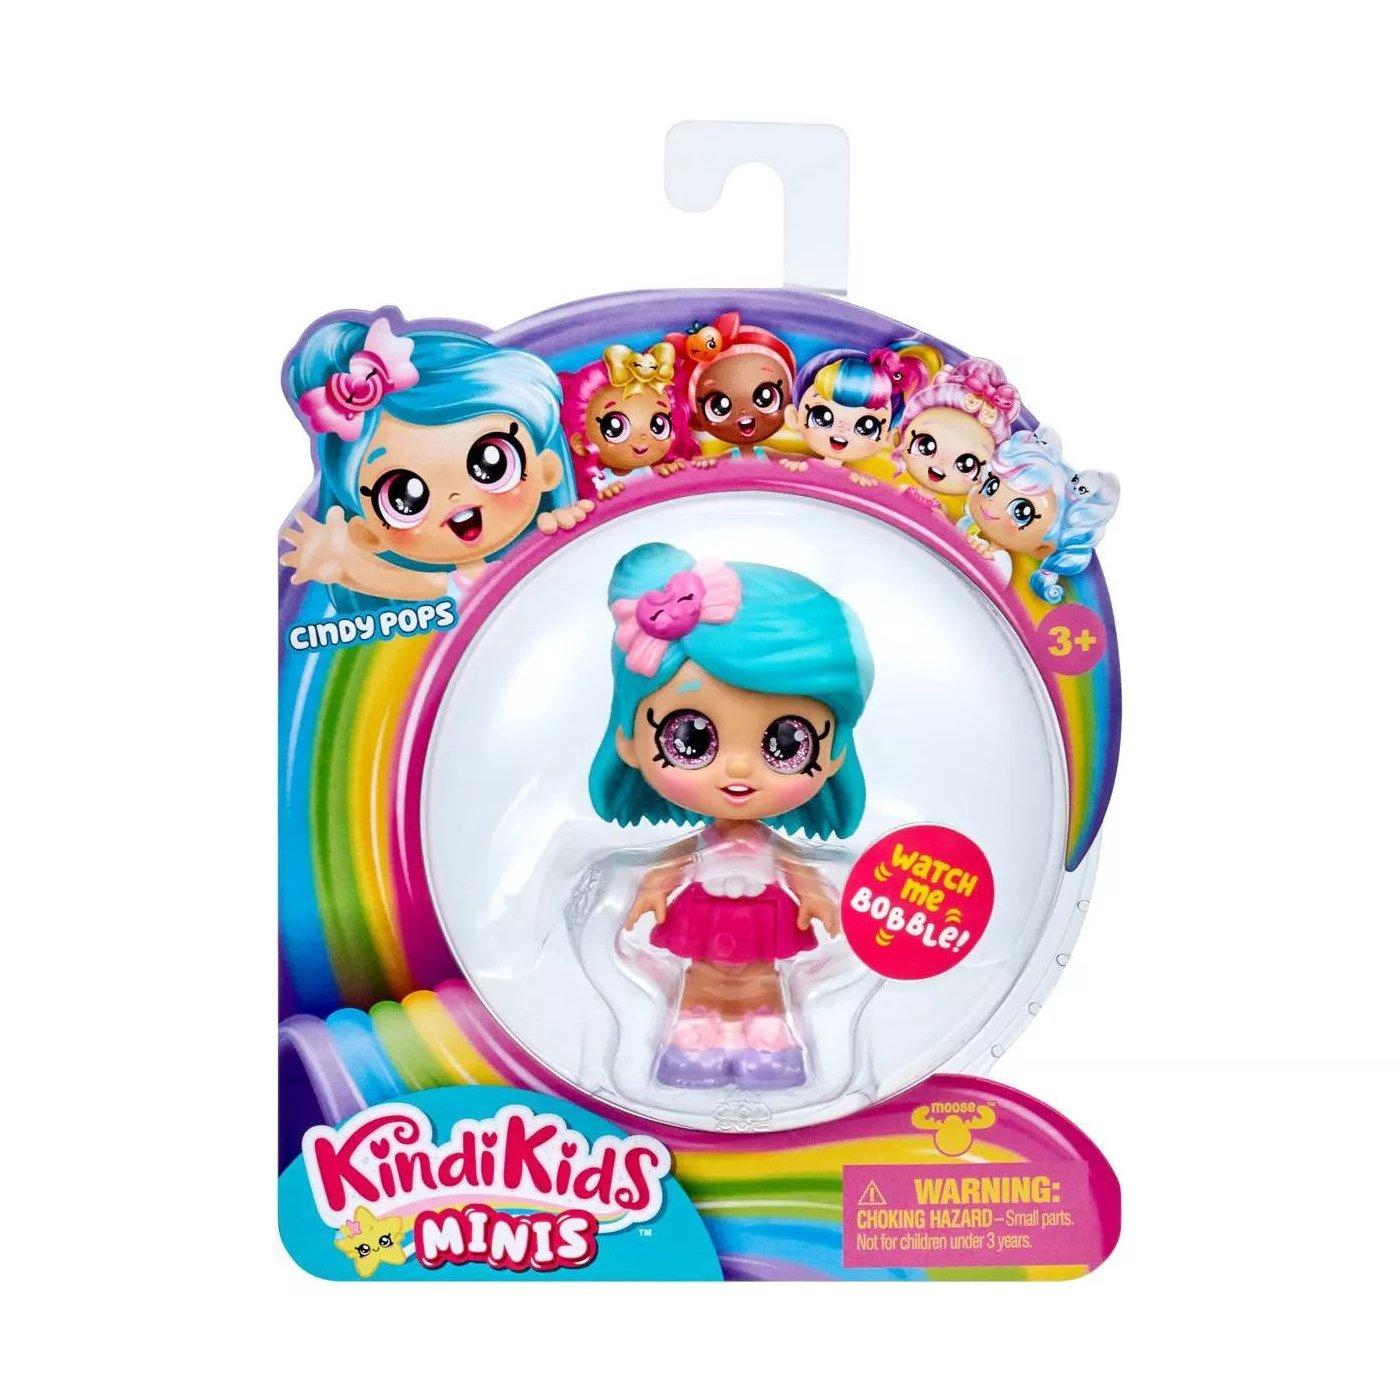 Kindi Kids Minis 娃娃 Cindy Pops